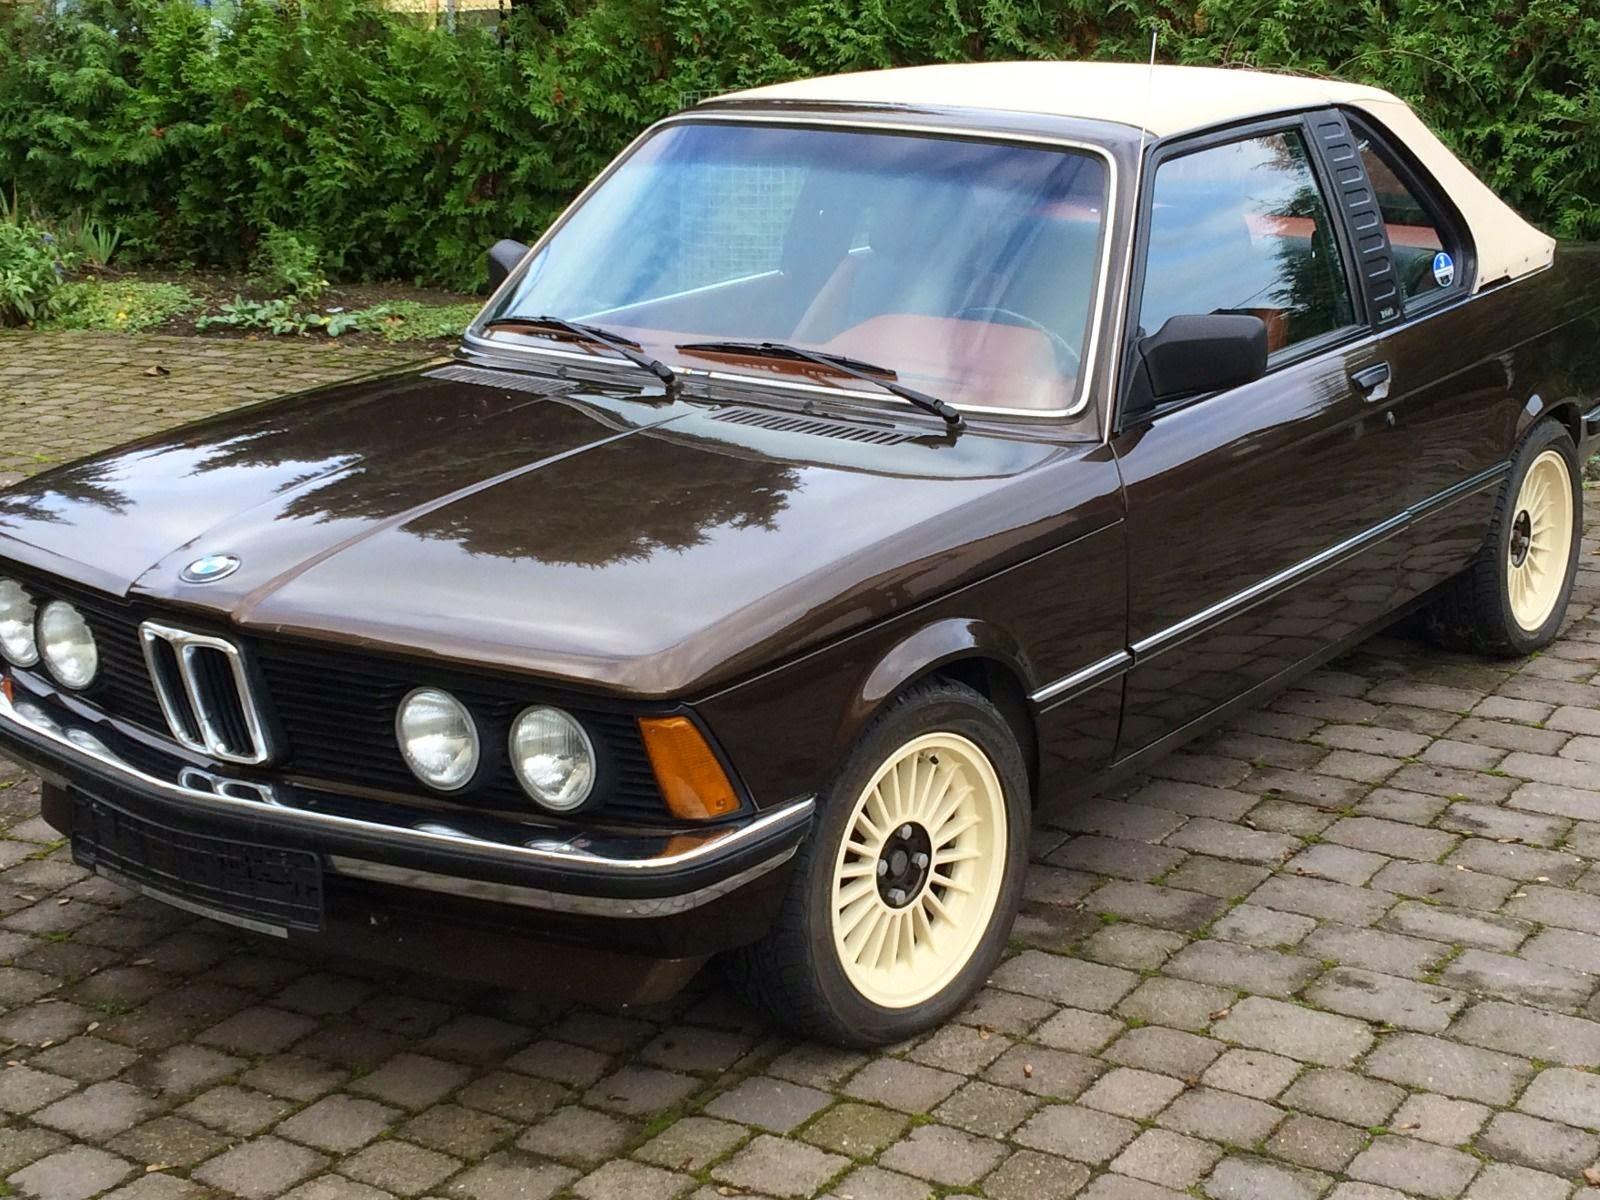 %24_57 Fascinating Bmw Z1 for Sale Ebay Cars Trend